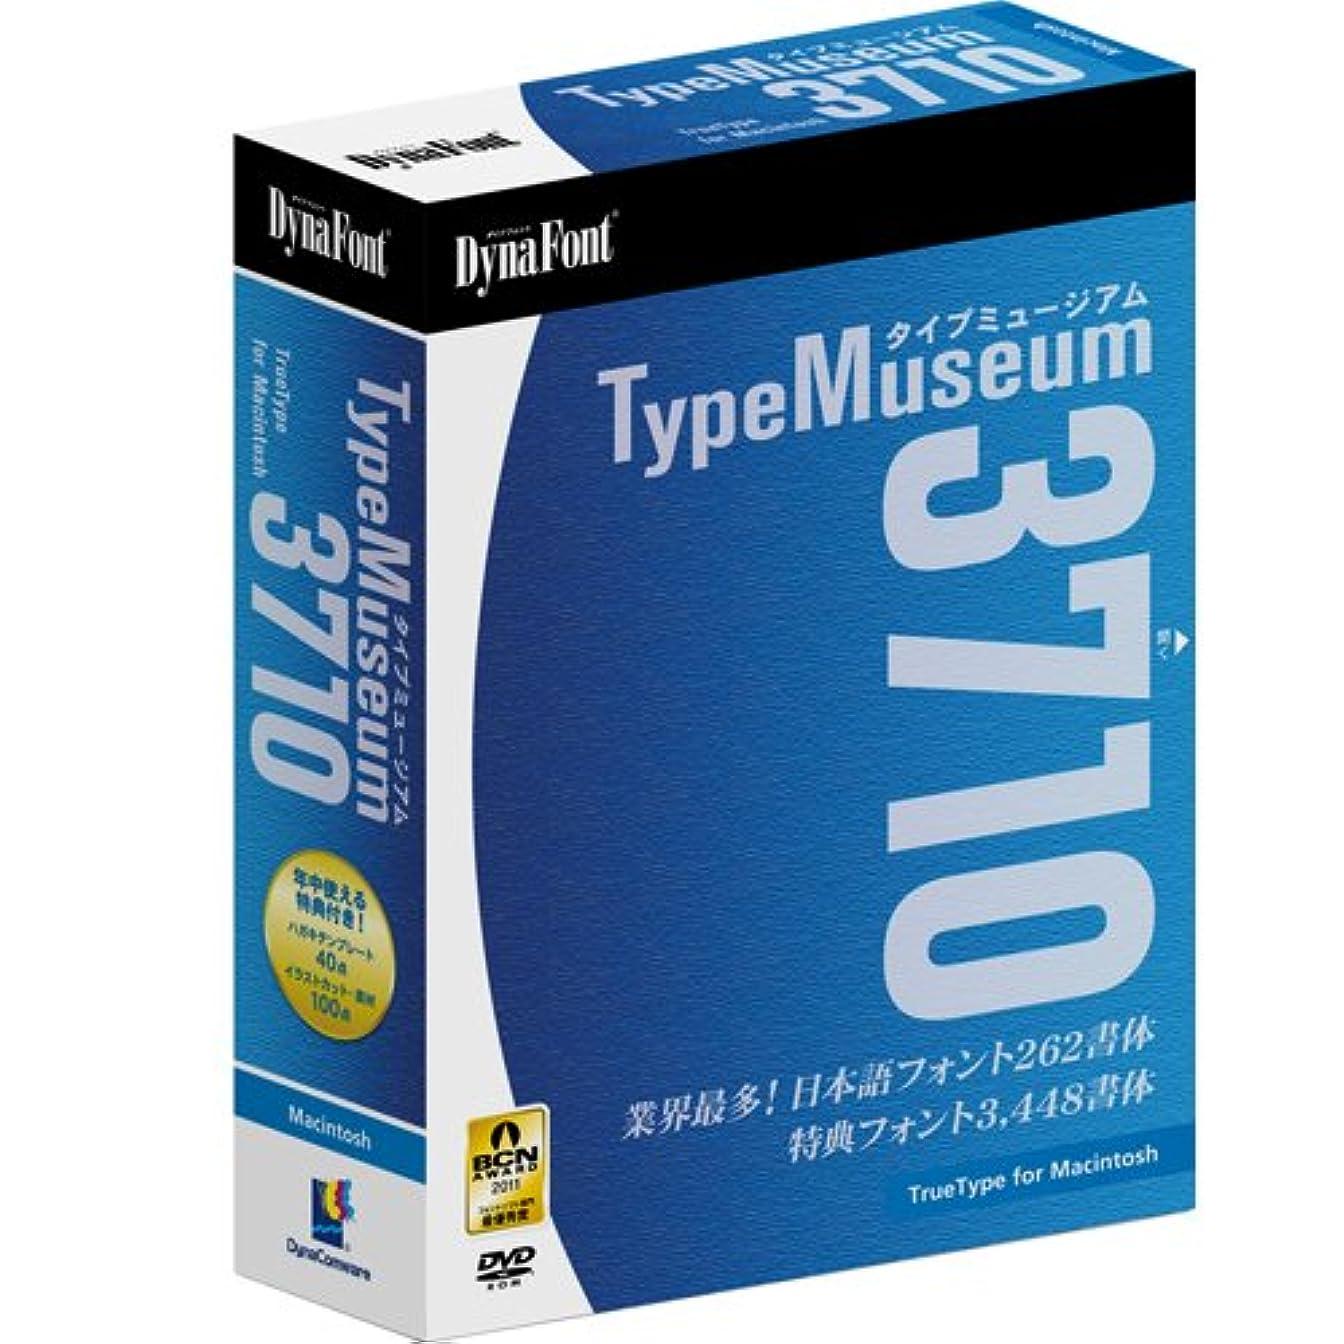 DynaFont TypeMuseum 3710 TrueType for Macintosh